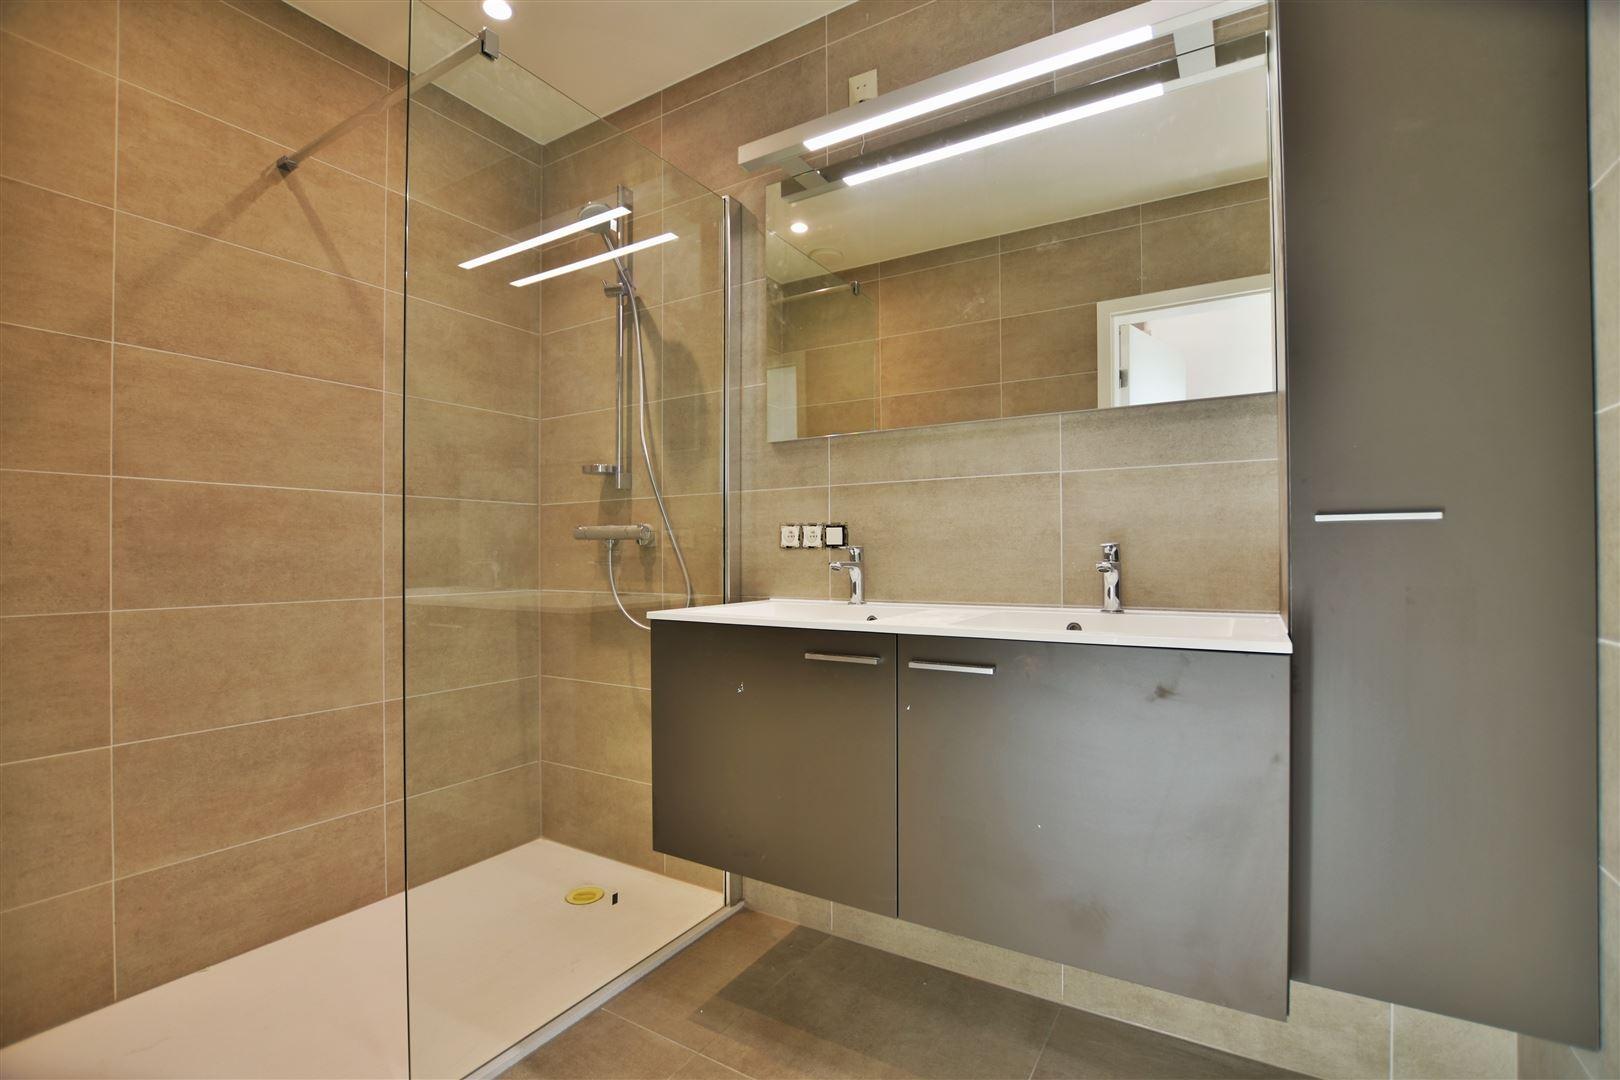 Foto 13 : Duplex/Penthouse te 9200 APPELS (België) - Prijs € 800